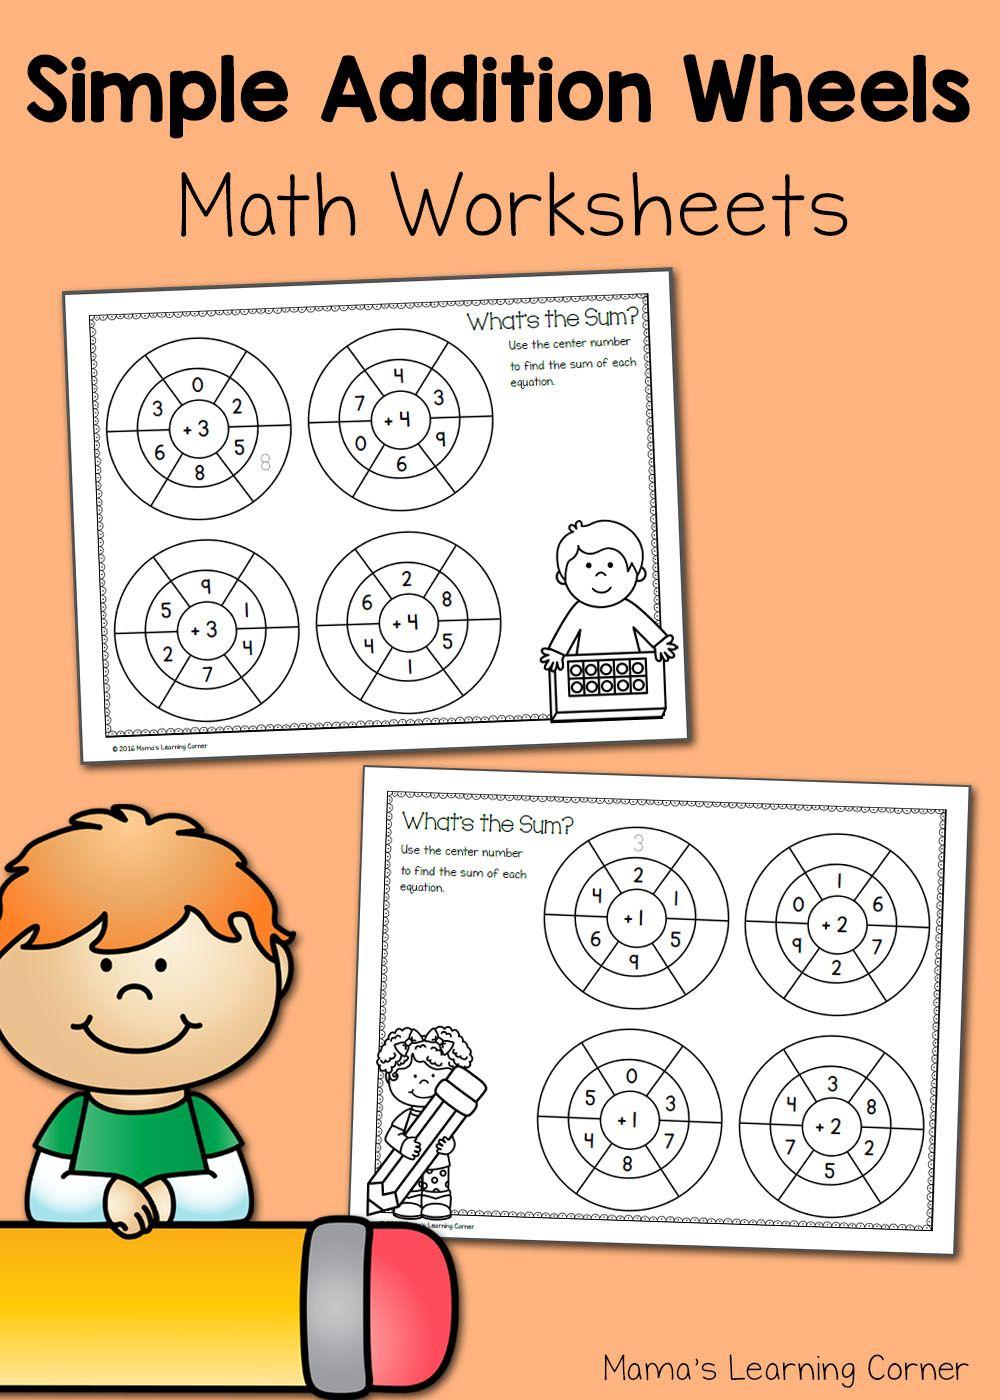 Simple Addition Wheels Math Worksheets Math Worksheets Fun Math Math Activities